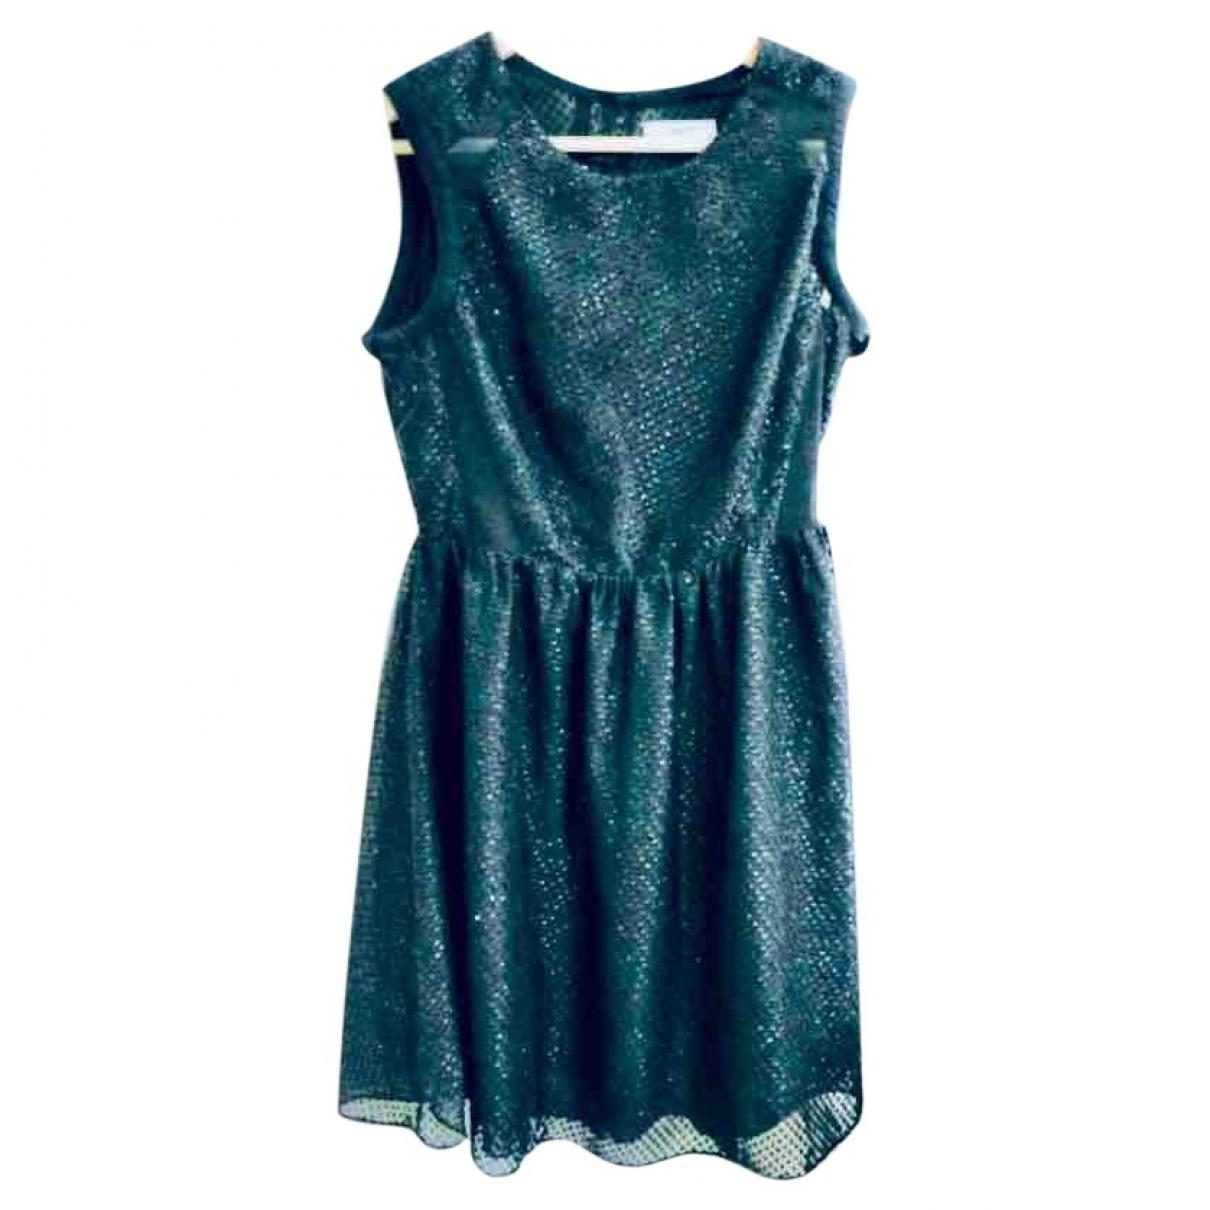 Suncoo \N Black dress for Women 40 FR